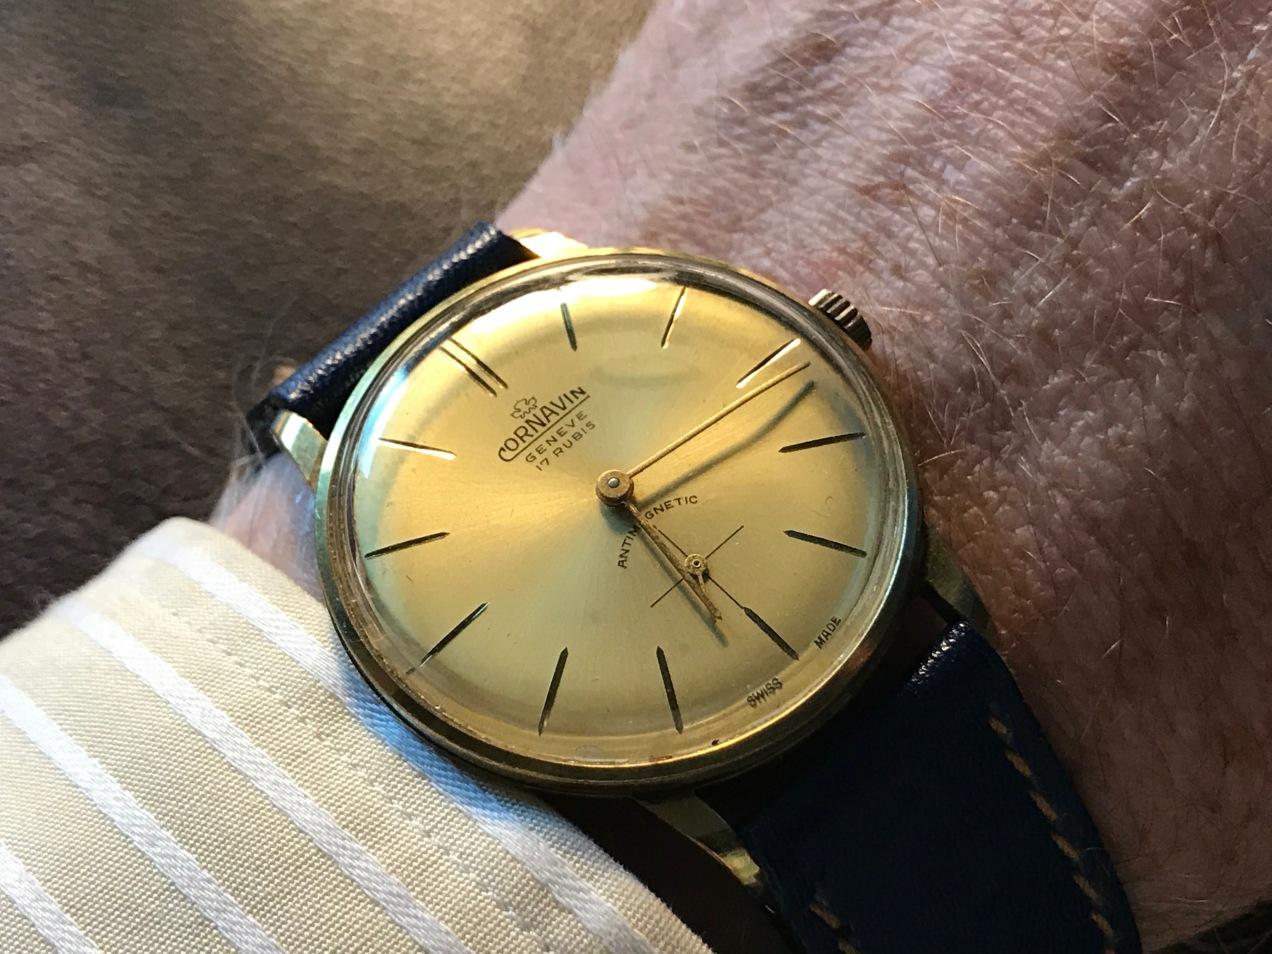 A 1940s Cornavin Geneve Watch